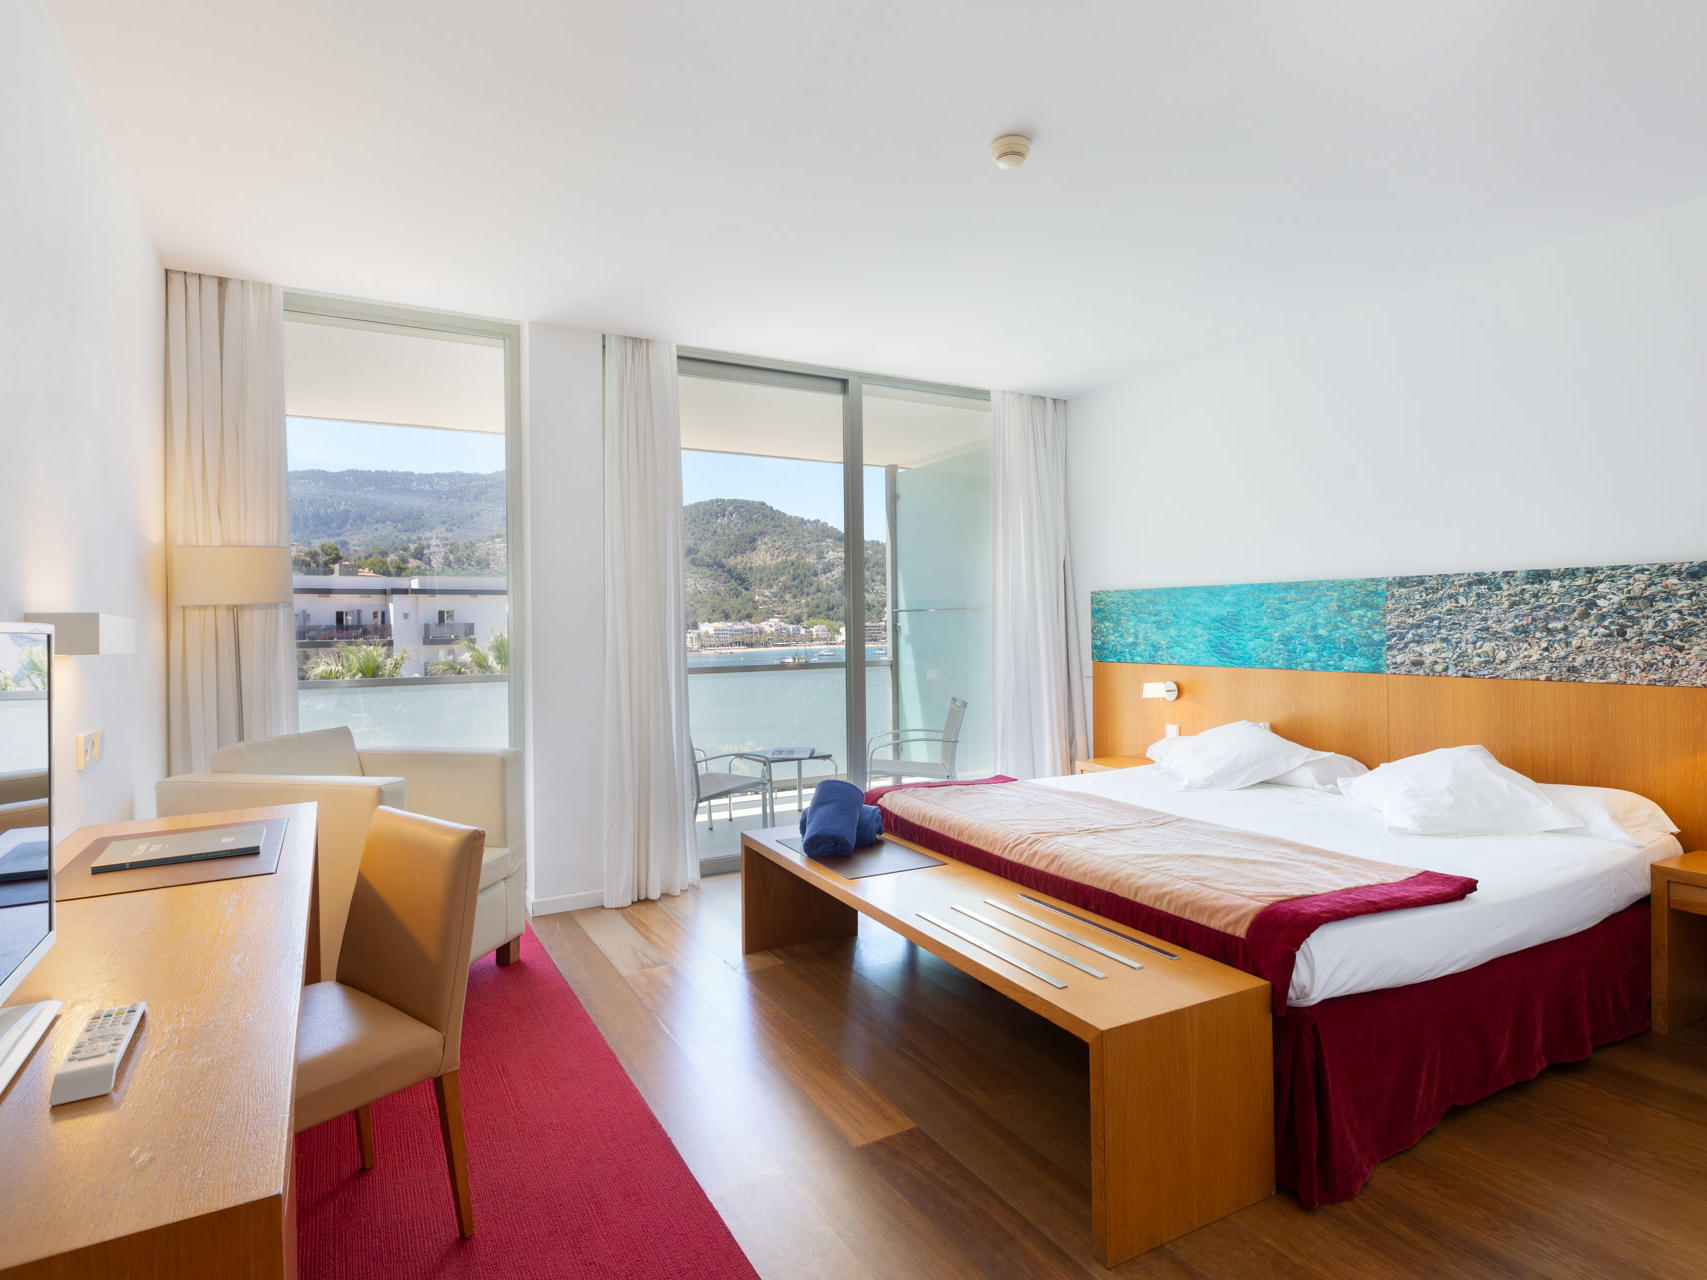 Superior Zimmer Mit Meerblick - Aimia Port de Soller